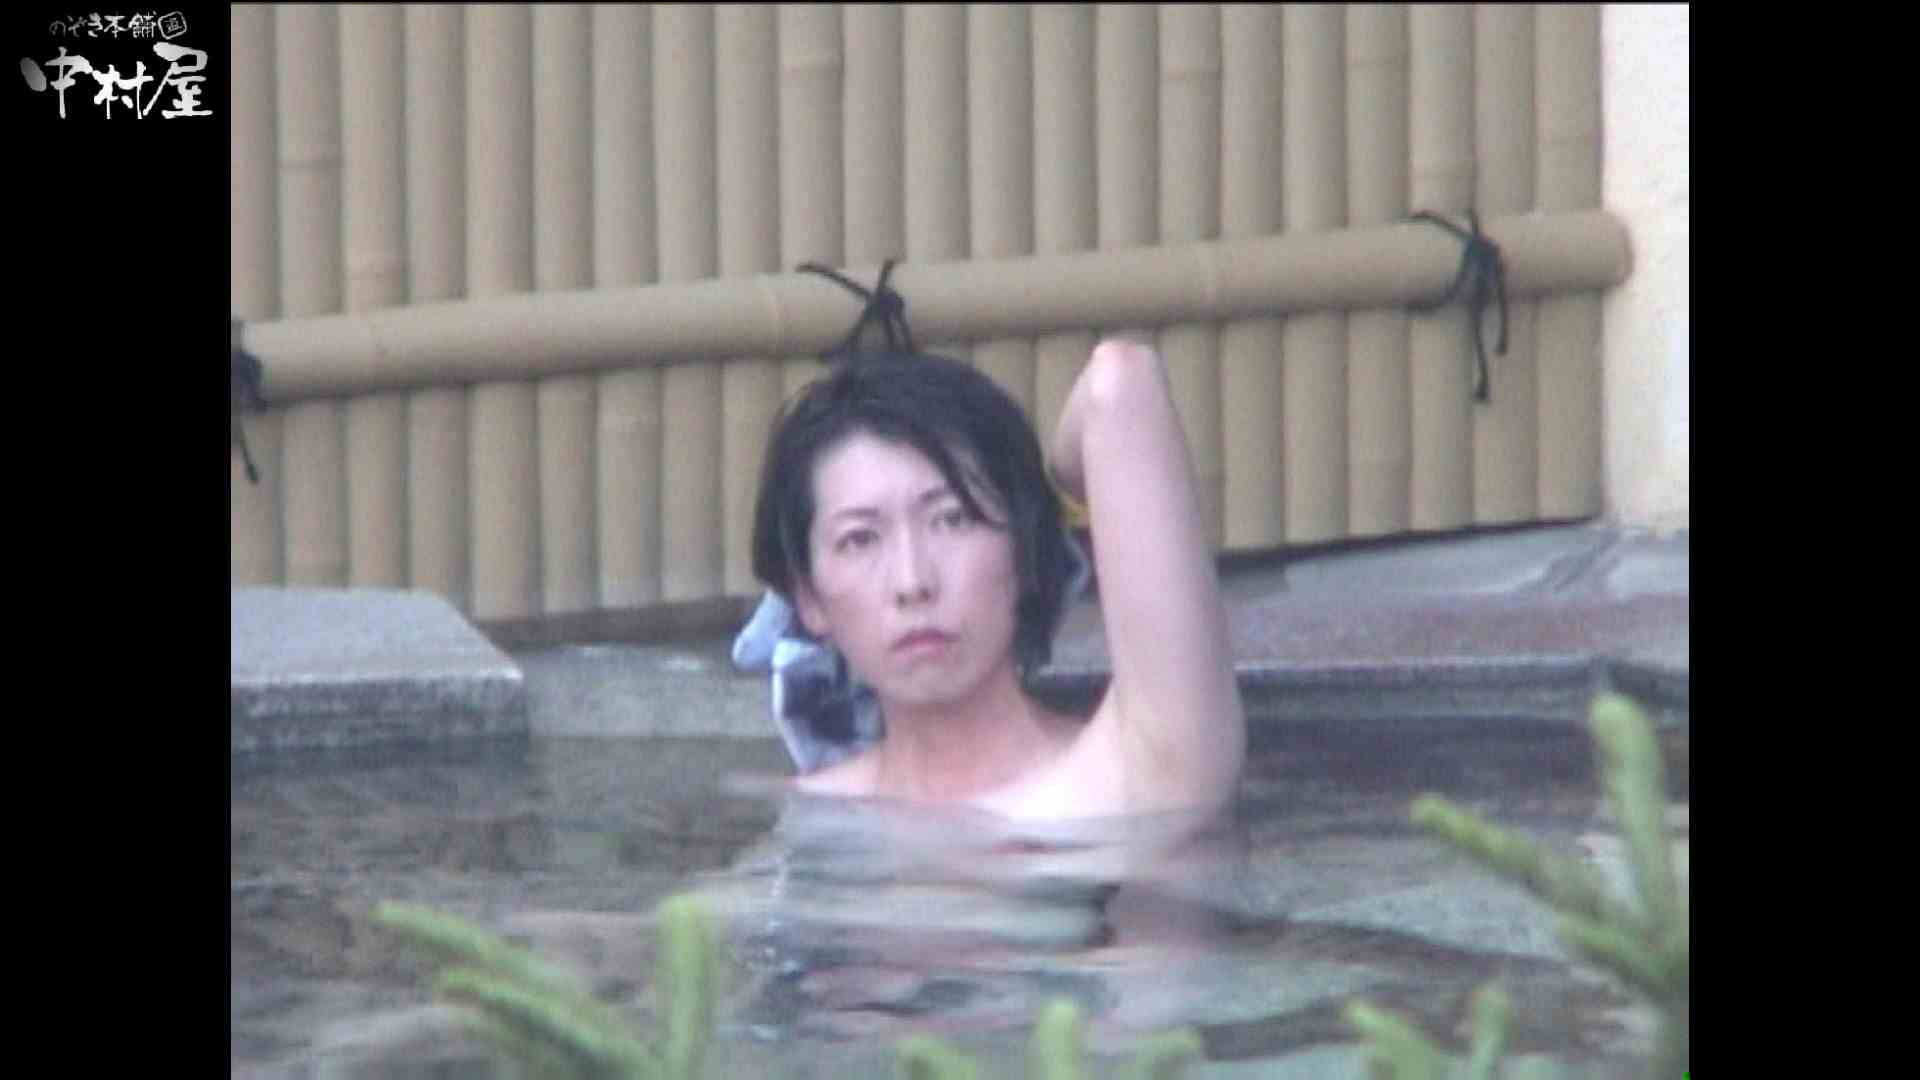 Aquaな露天風呂Vol.987 0 | 0  61連発 9